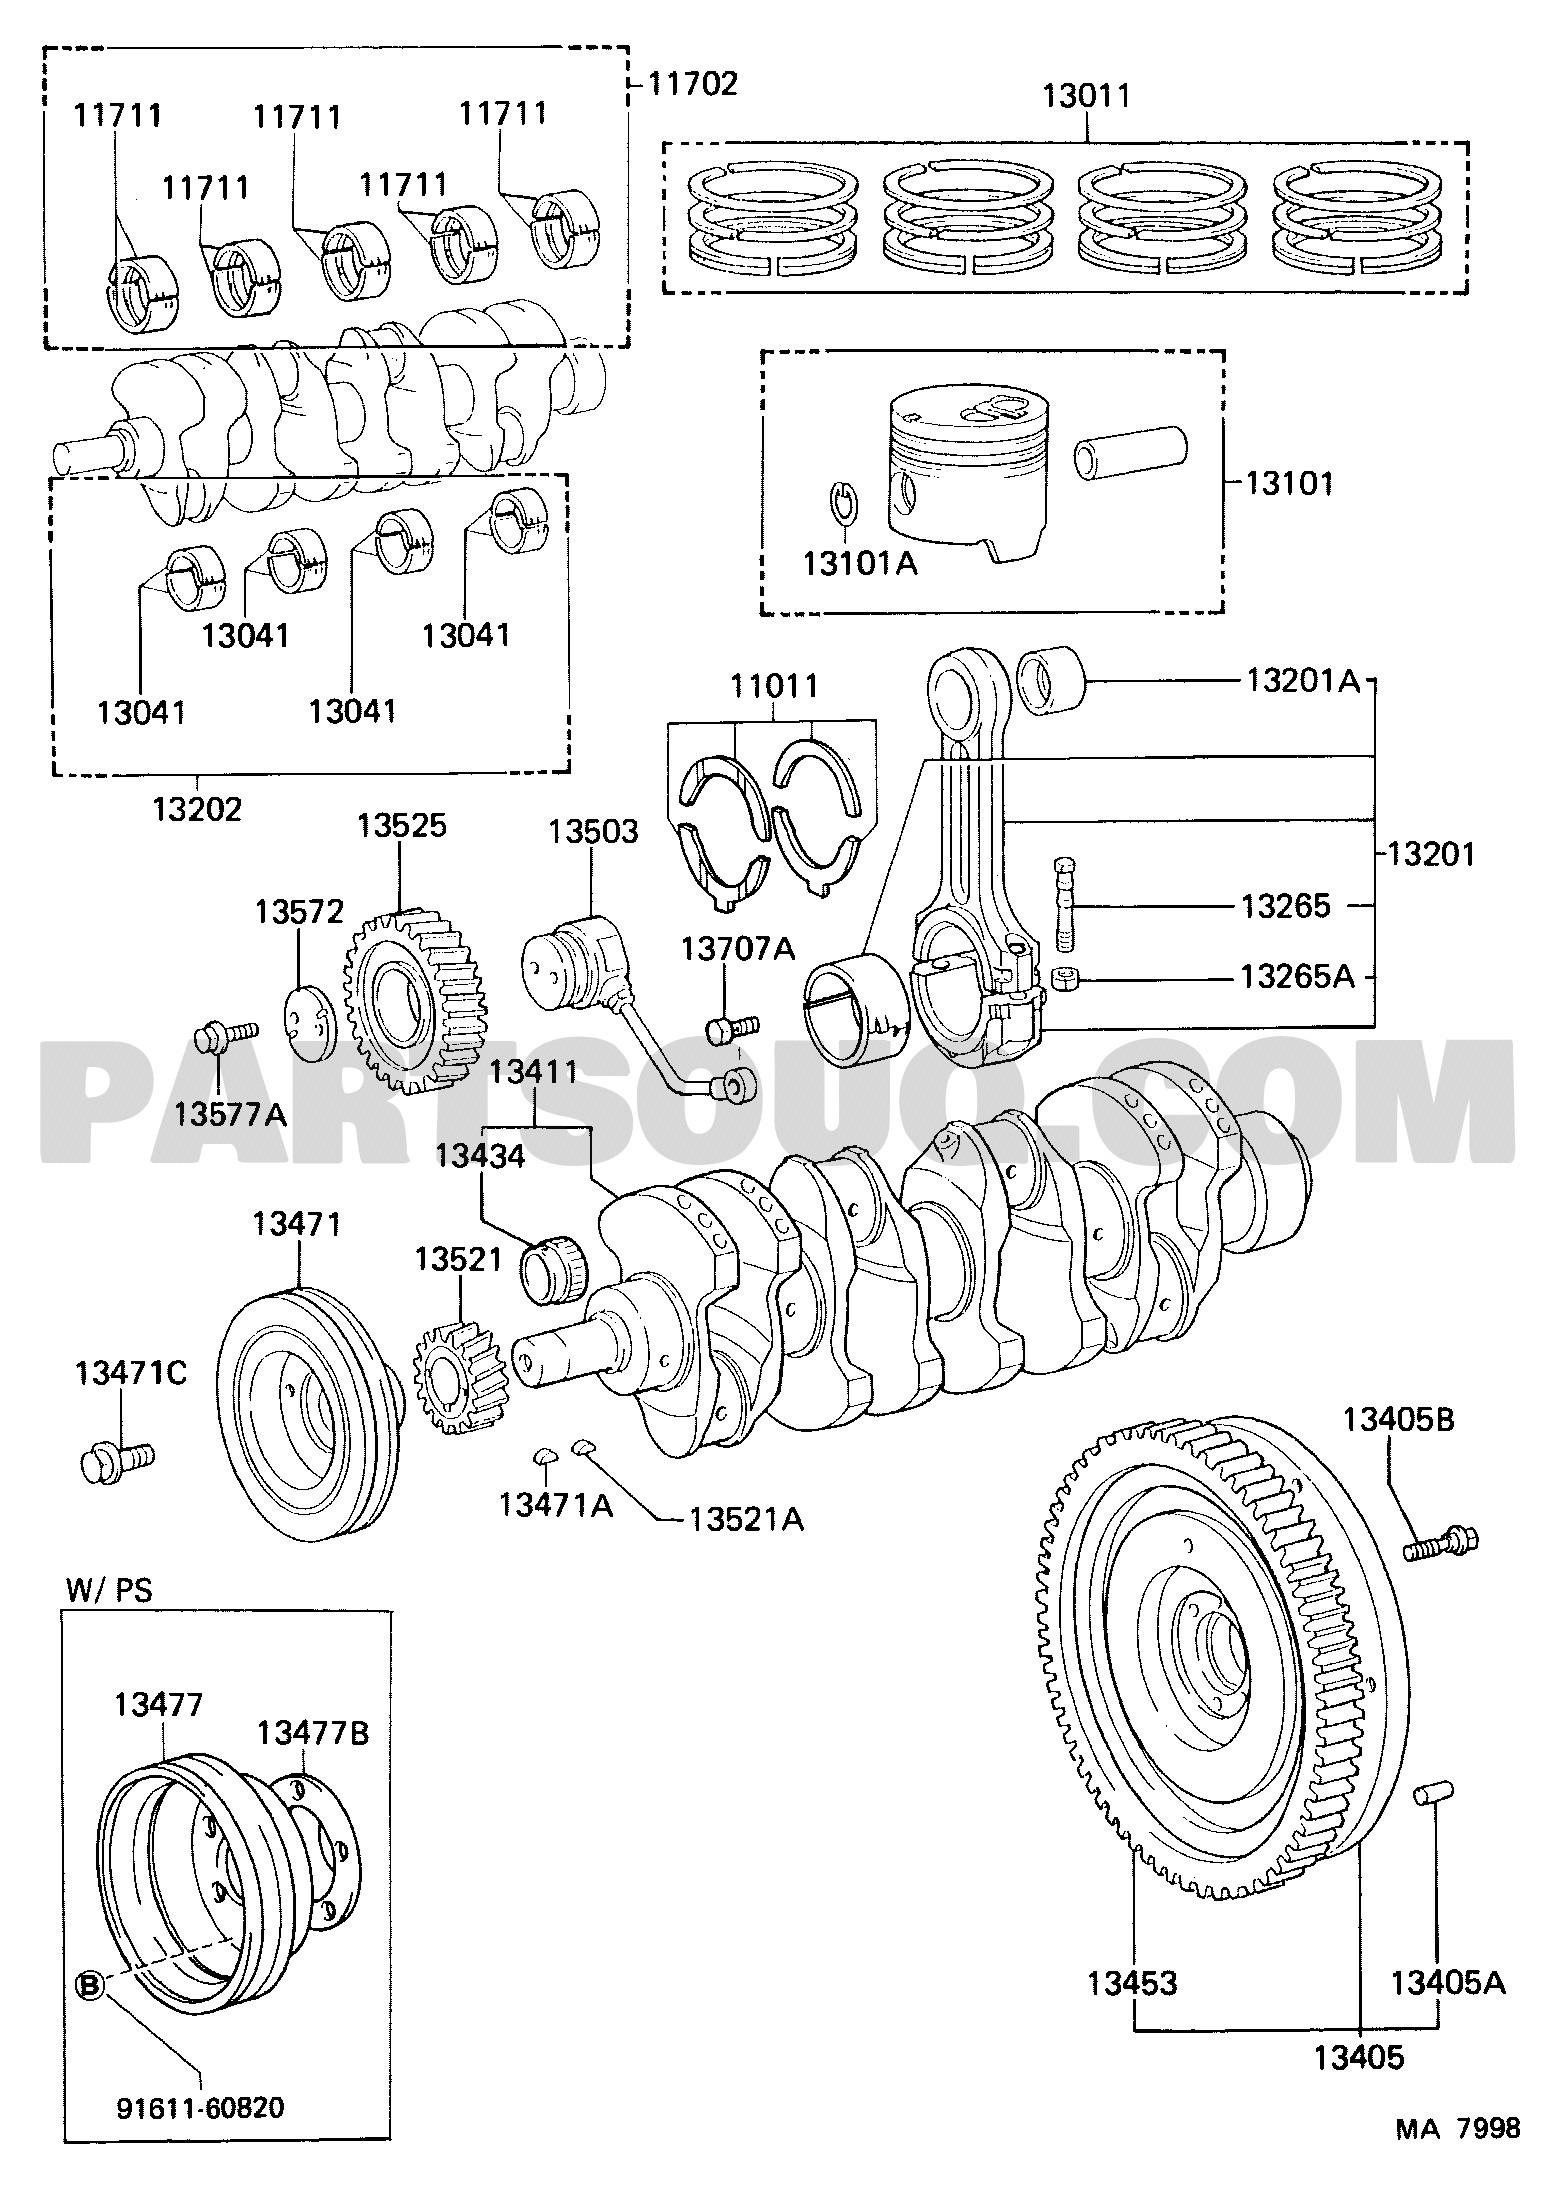 Car Engine Diagram Piston Crankshaft & Piston tool Engine Fuel Group Bj70lv Mrk Of Car Engine Diagram Piston